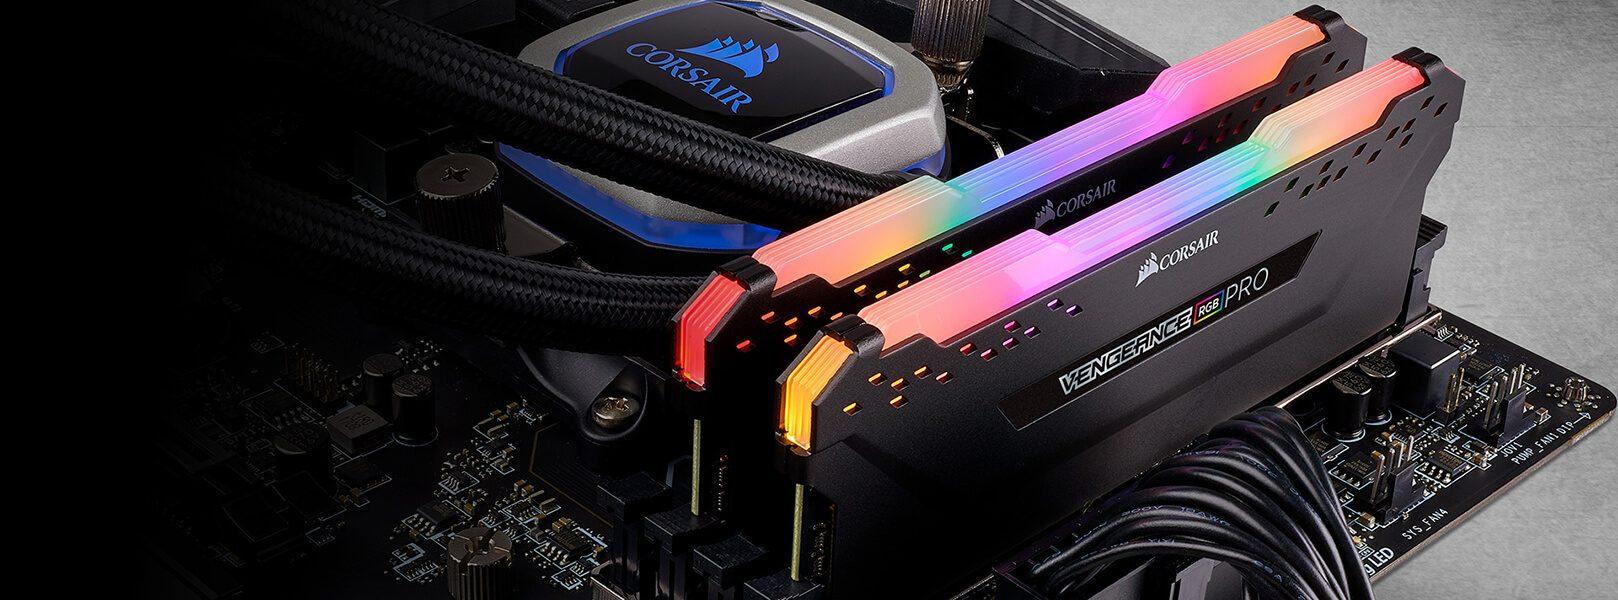 RAM Desktop DDR4 Corsair Vengeance RGB PRO 8GB Bus 3000 CMW8GX4M1D3000C16 6